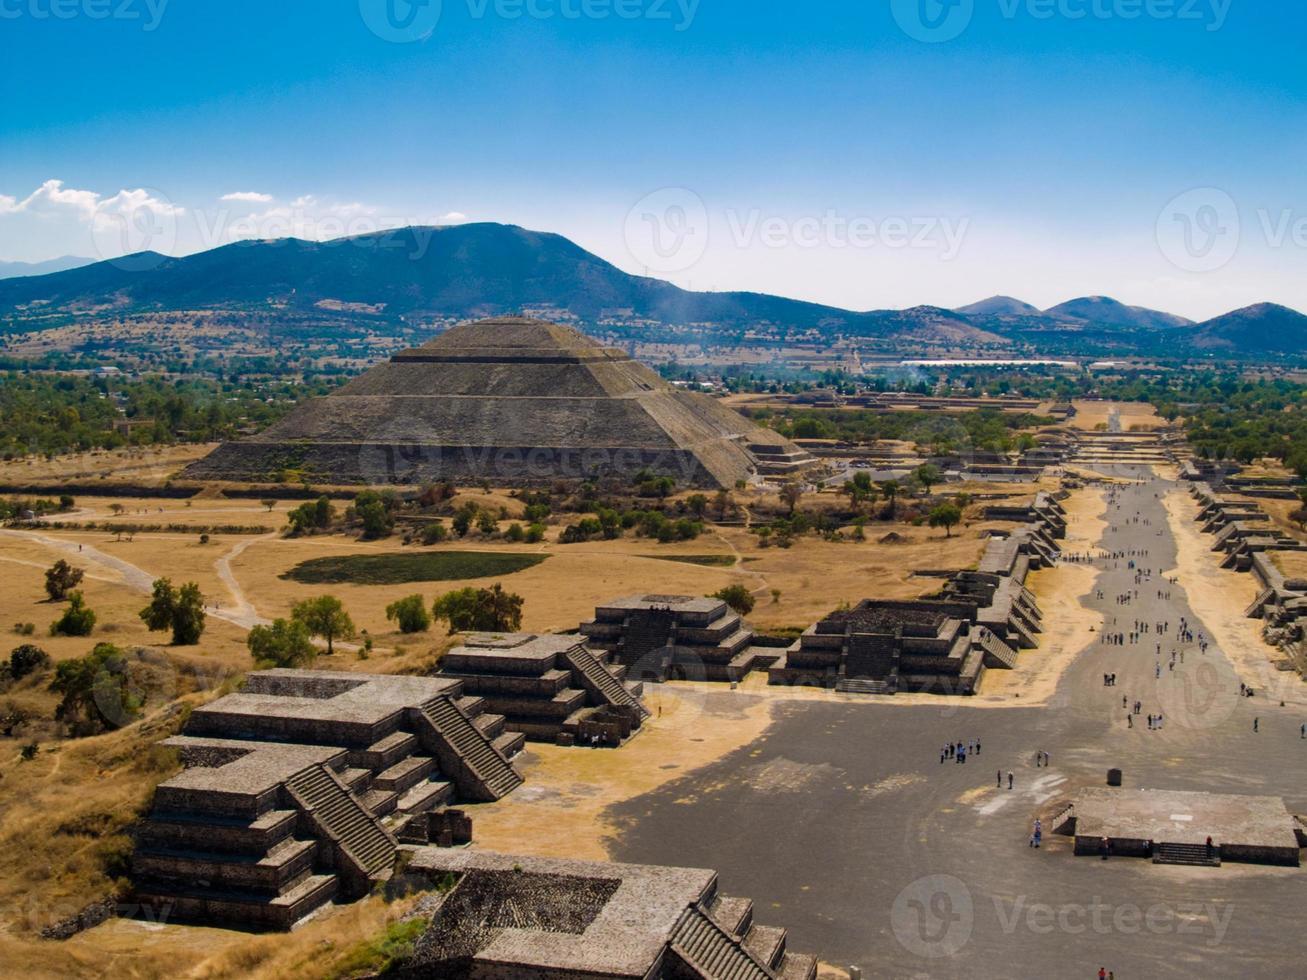 schönes Foto der Teotihuacan Pyramiden